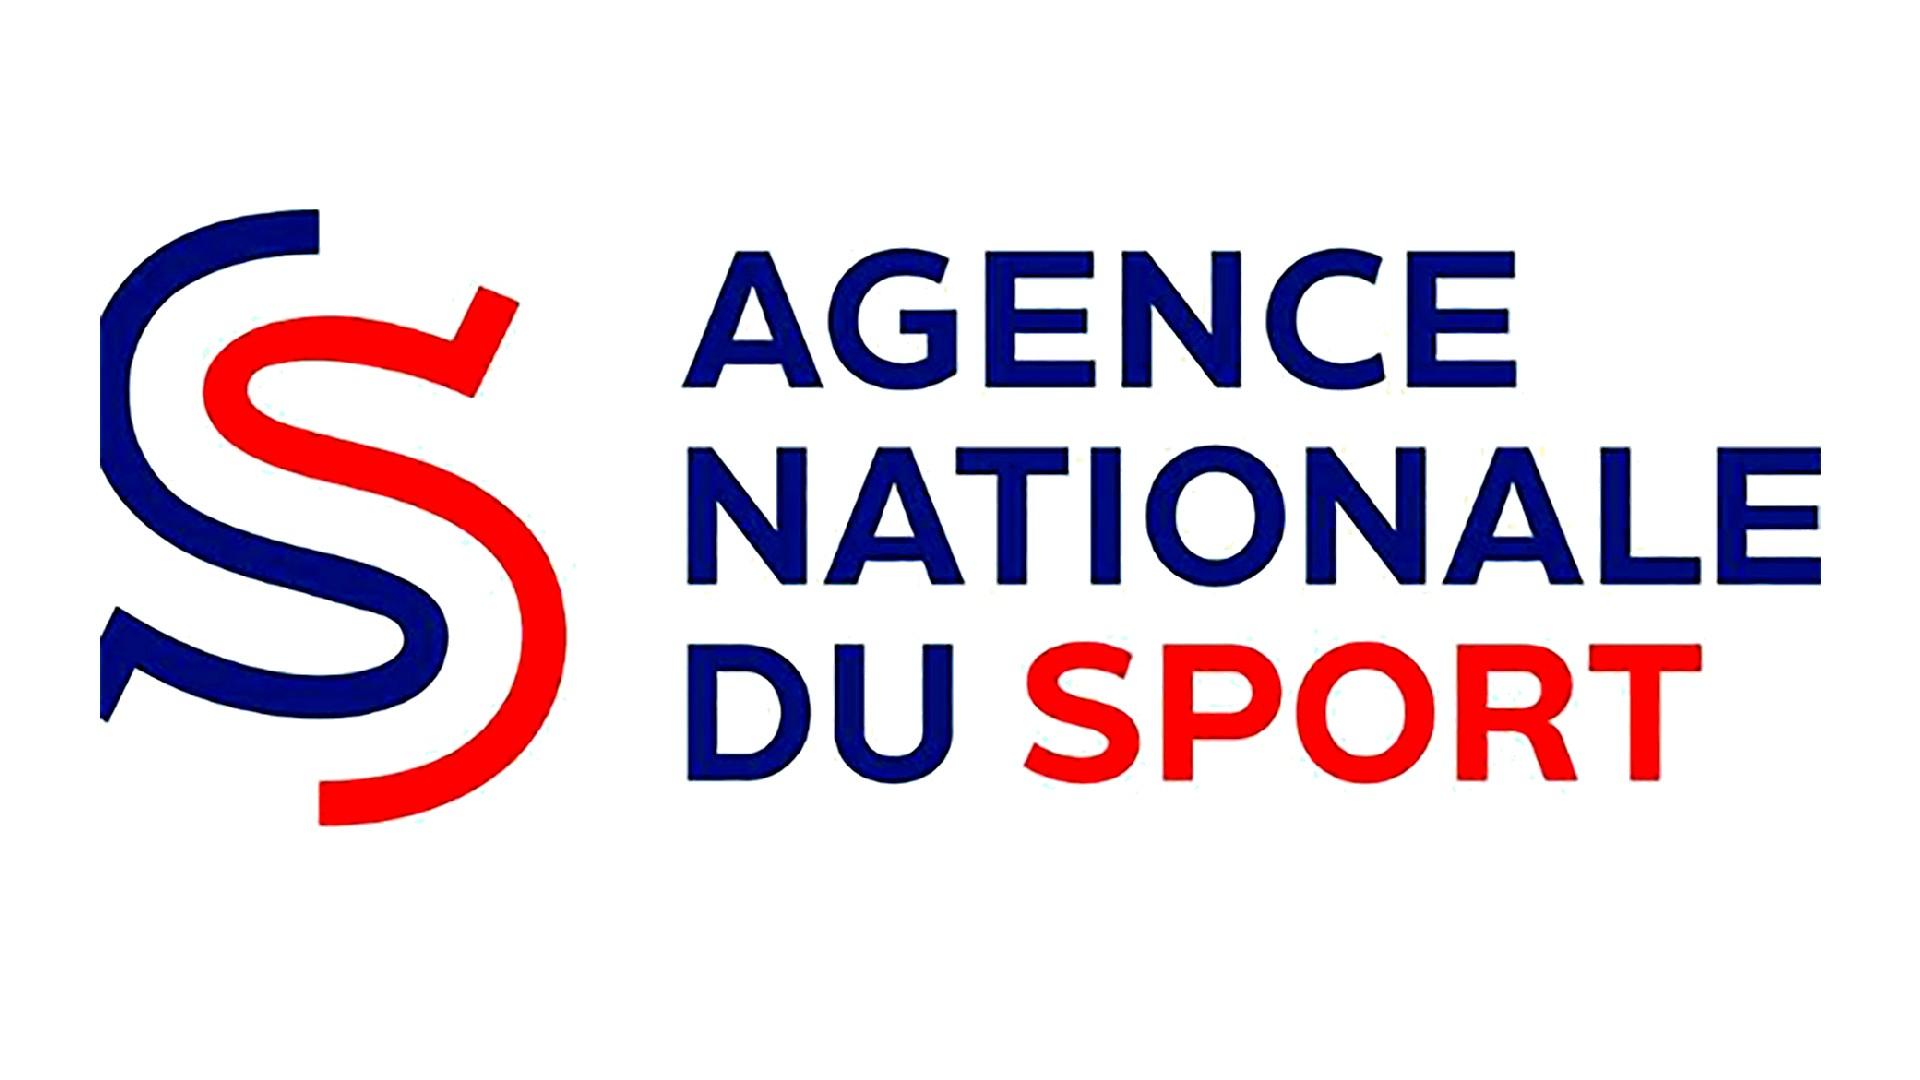 Agence Nationale du Sport (6) Logo